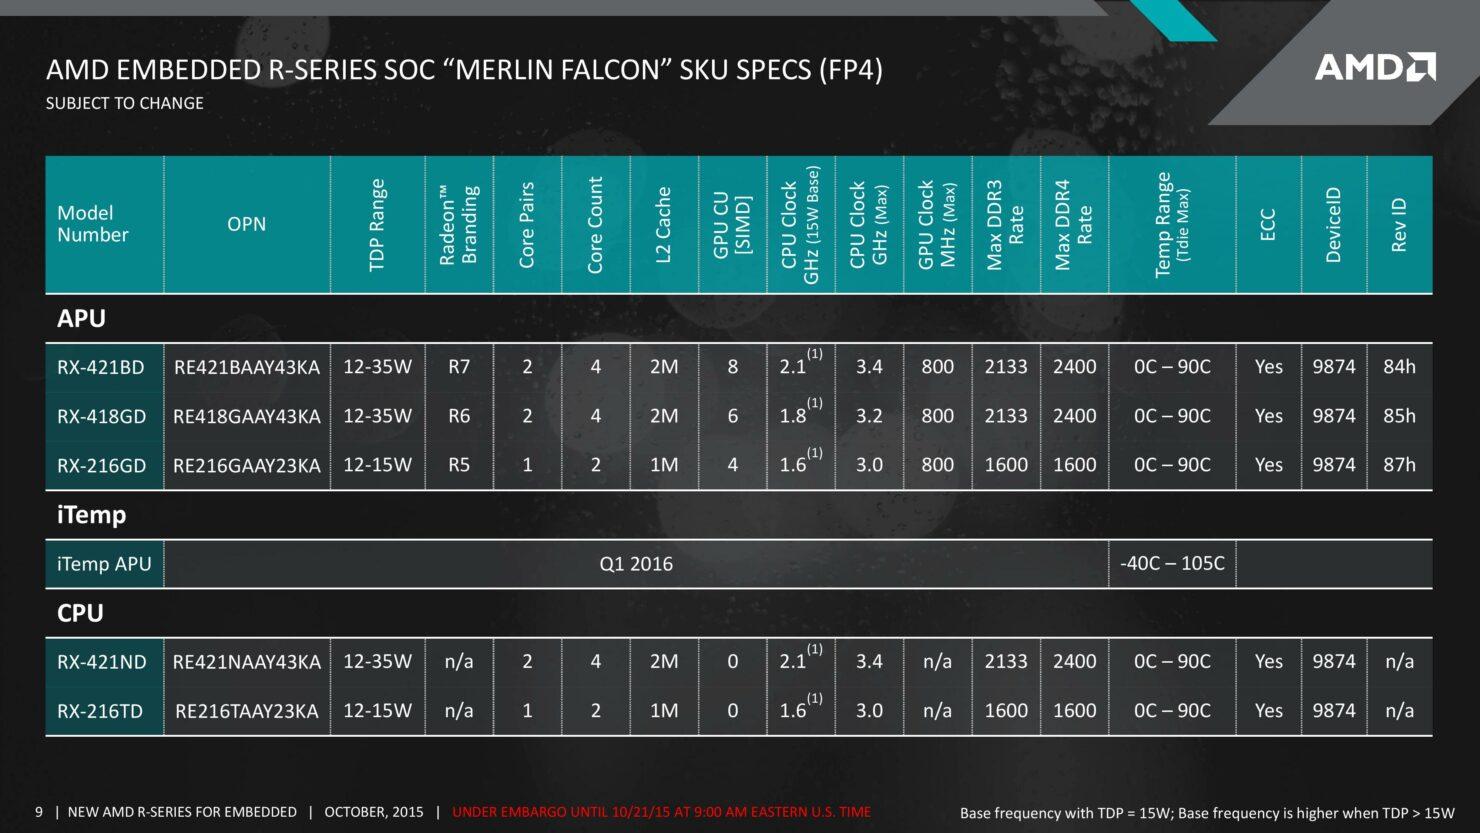 amd-merlin-falcon-soc-carrizo-apu_r-series-lineup